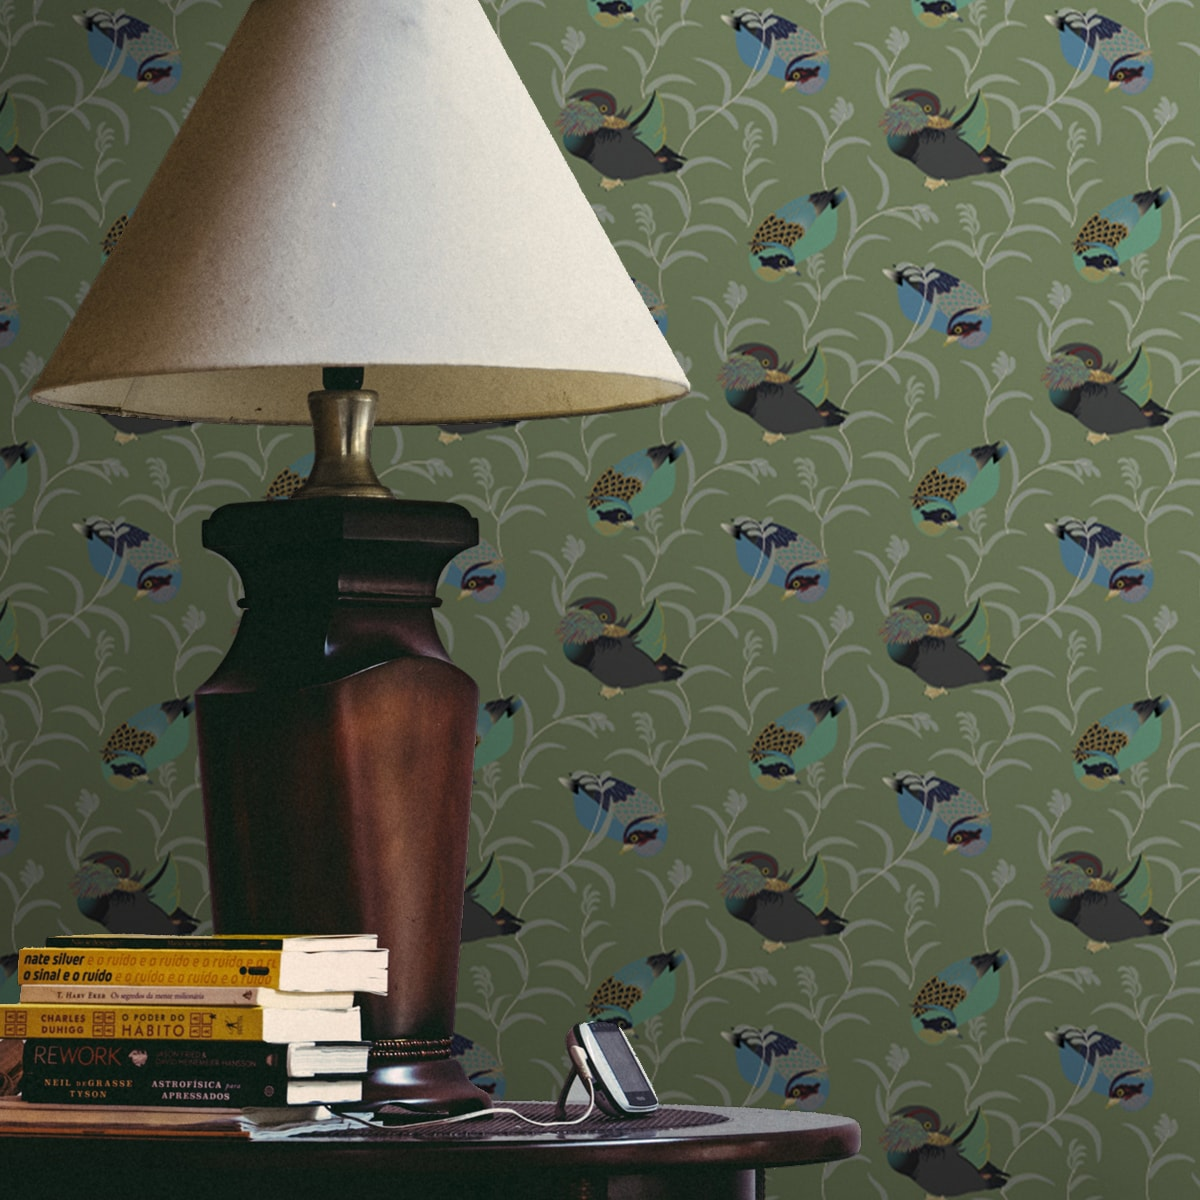 Wandtapete grün: Elegante Tapete